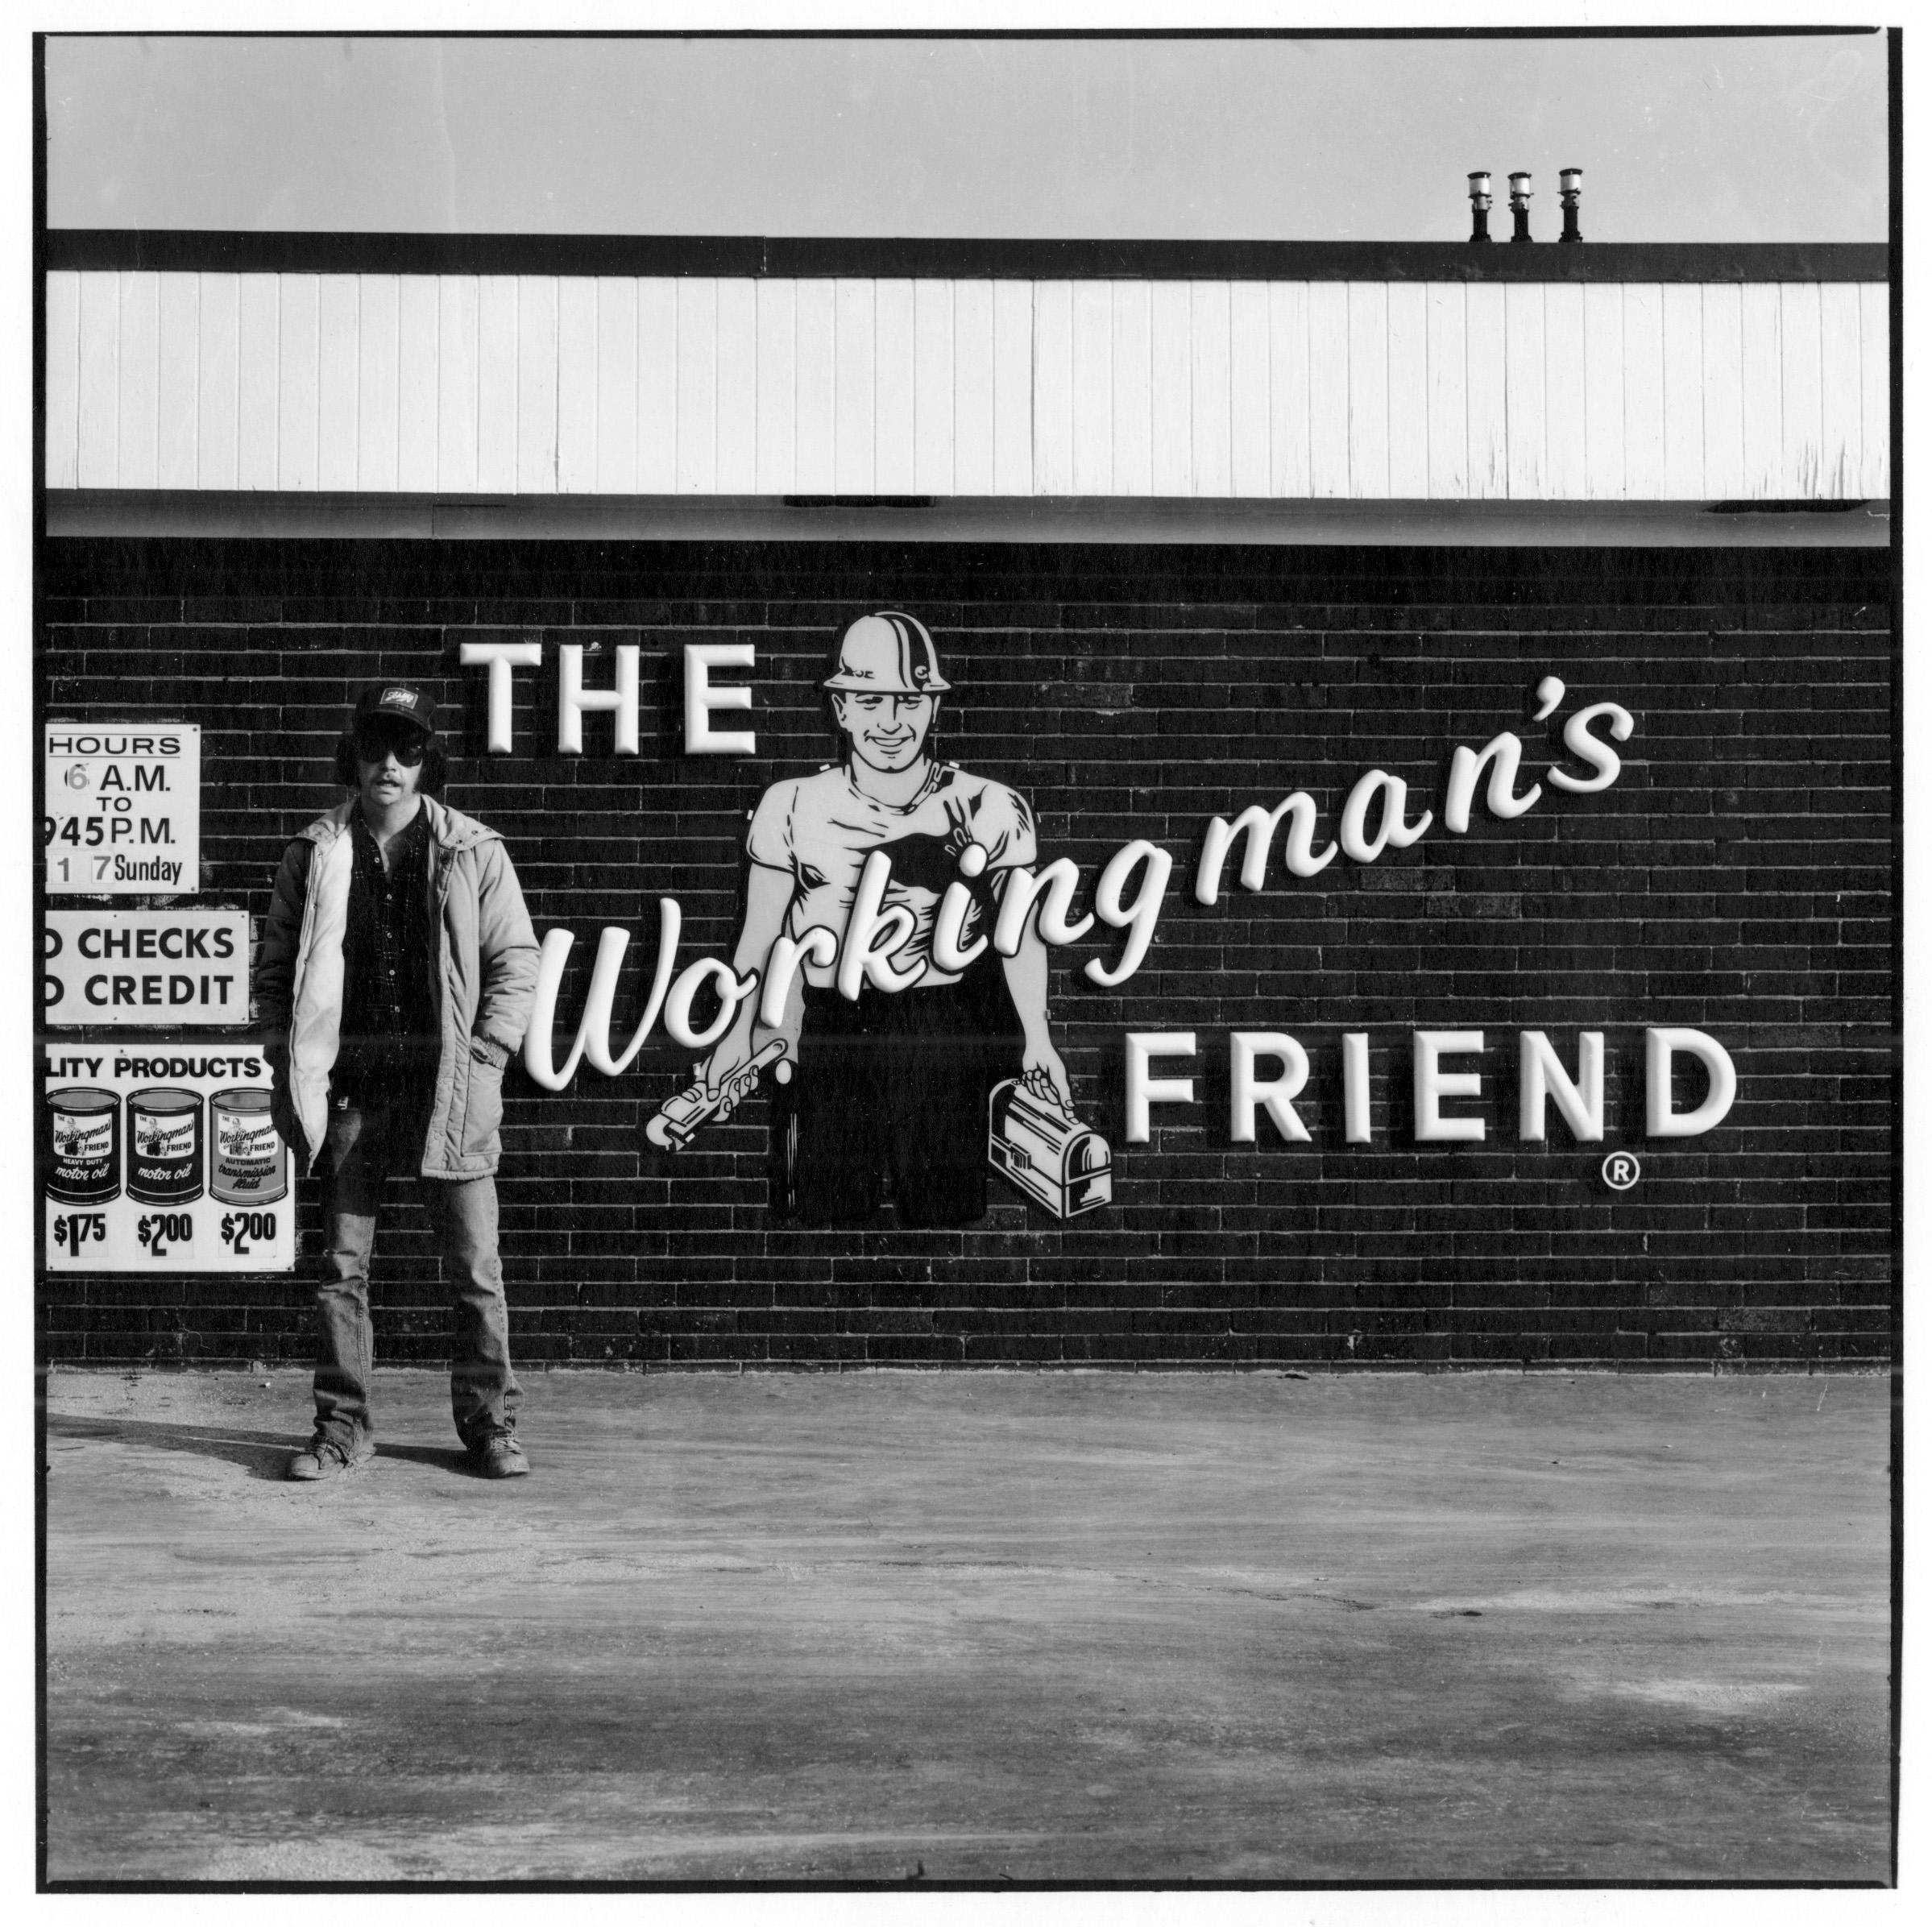 The Workingman's Friend Gas Station, Austin, 1982